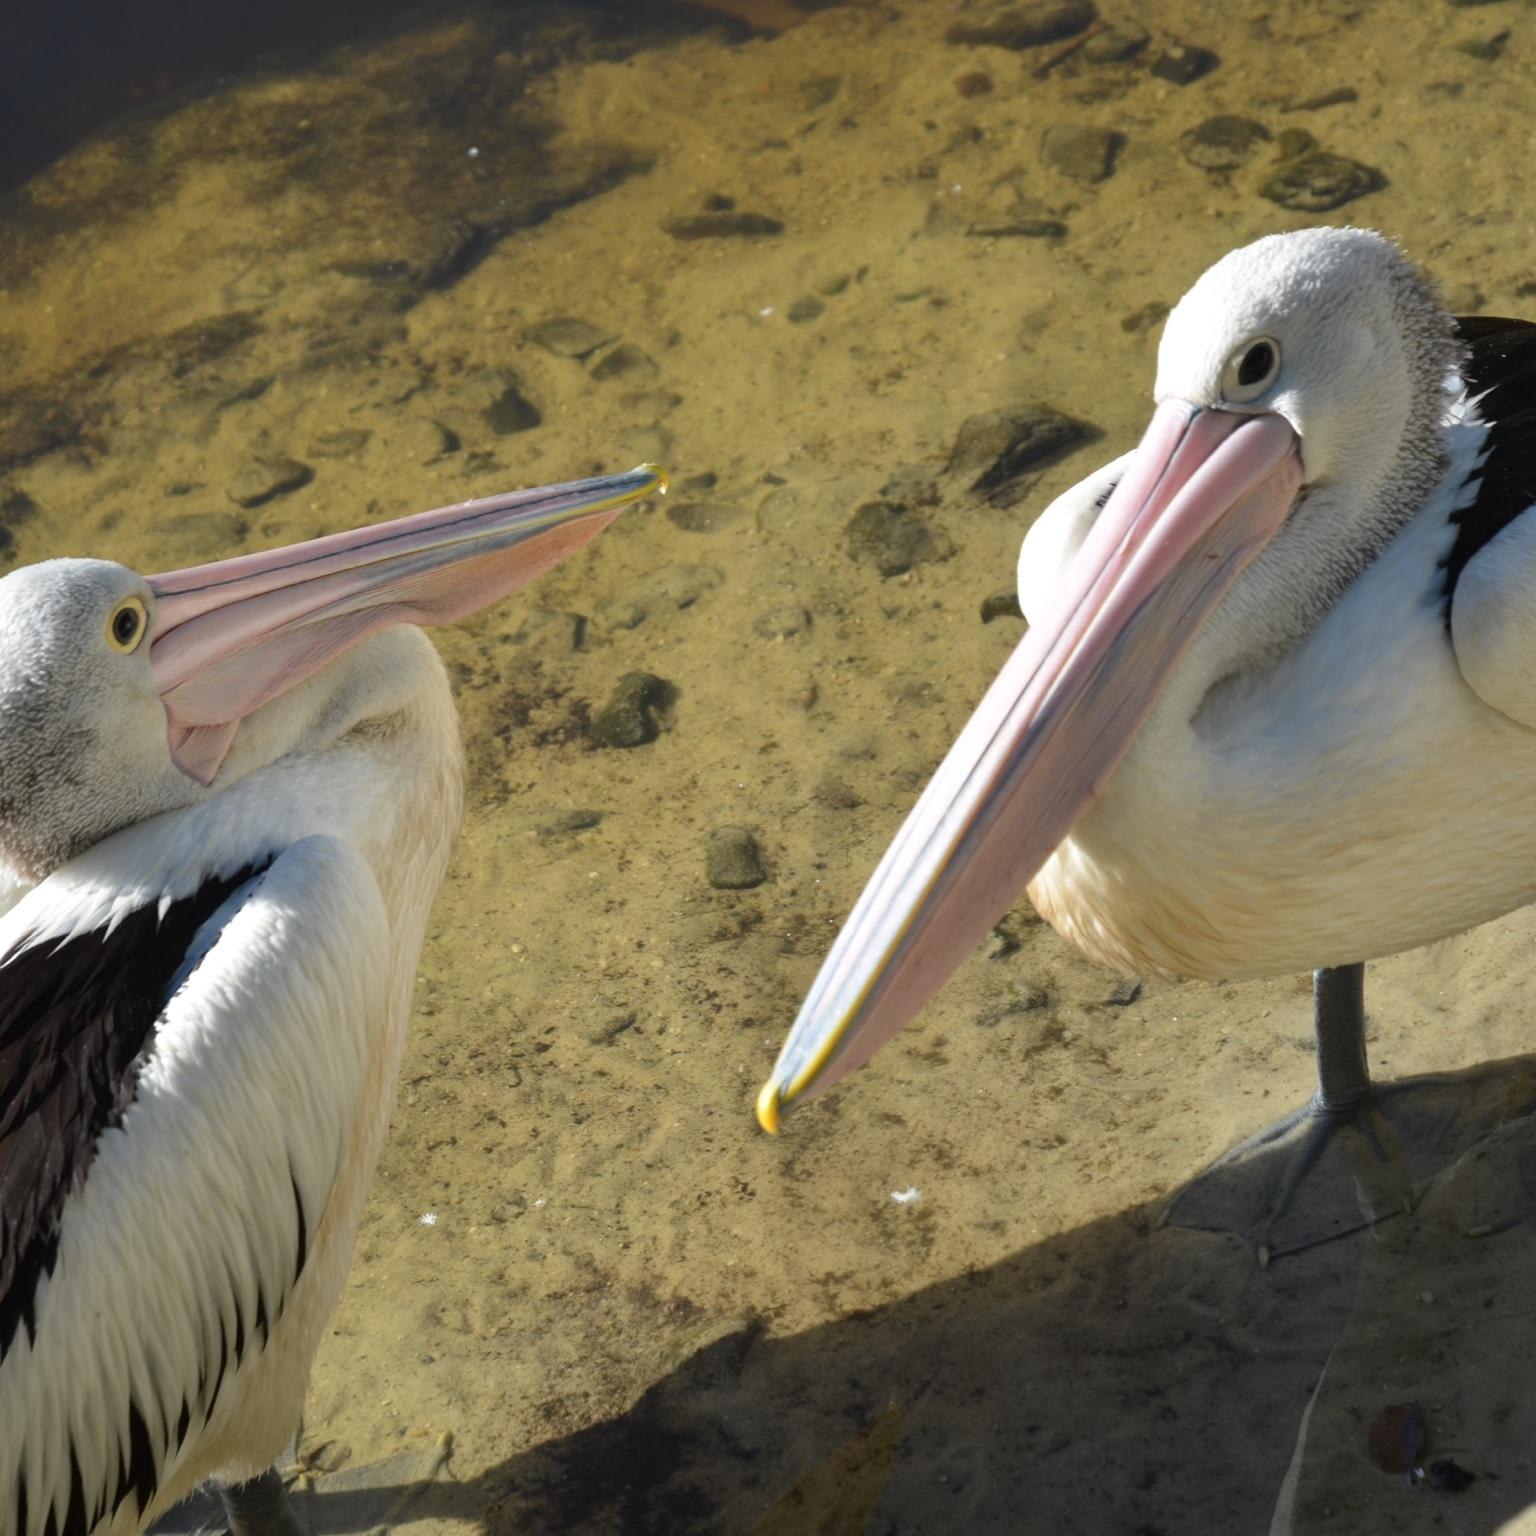 Pelicans, Currumbin Wildlife Sanctuary by Miles Dean for The Doubtful Traveller